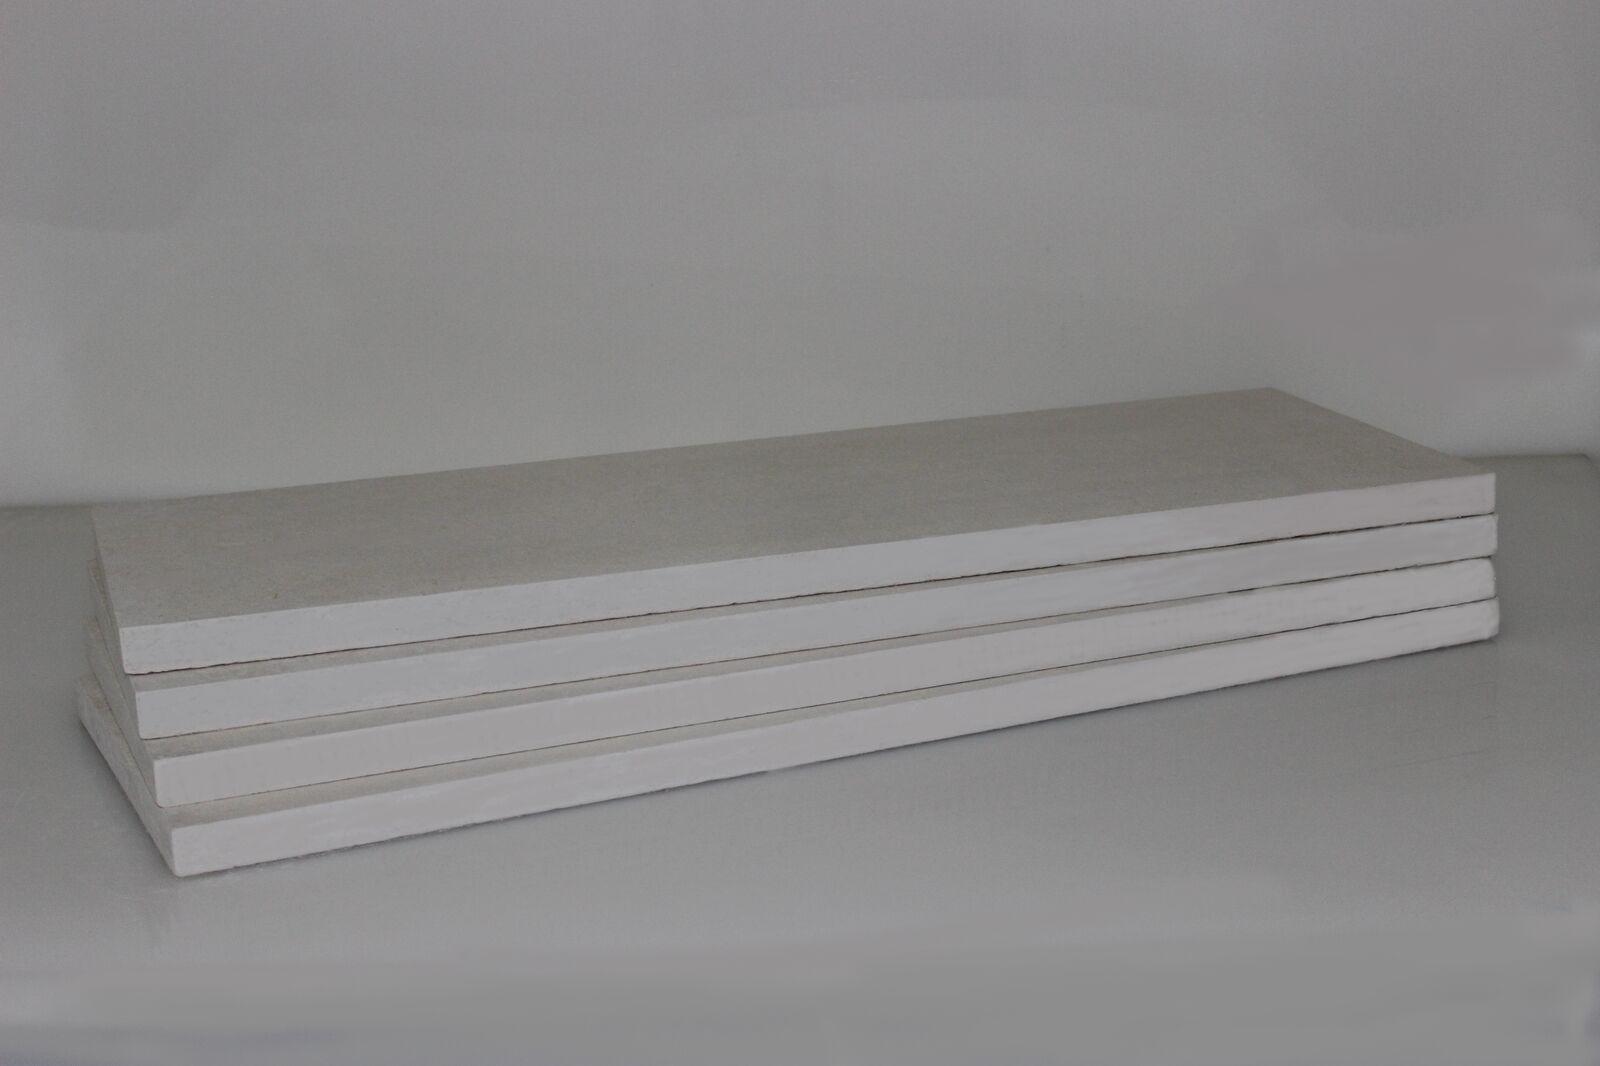 Promatect H 1 Platte 1000 x 500 x 20 mm